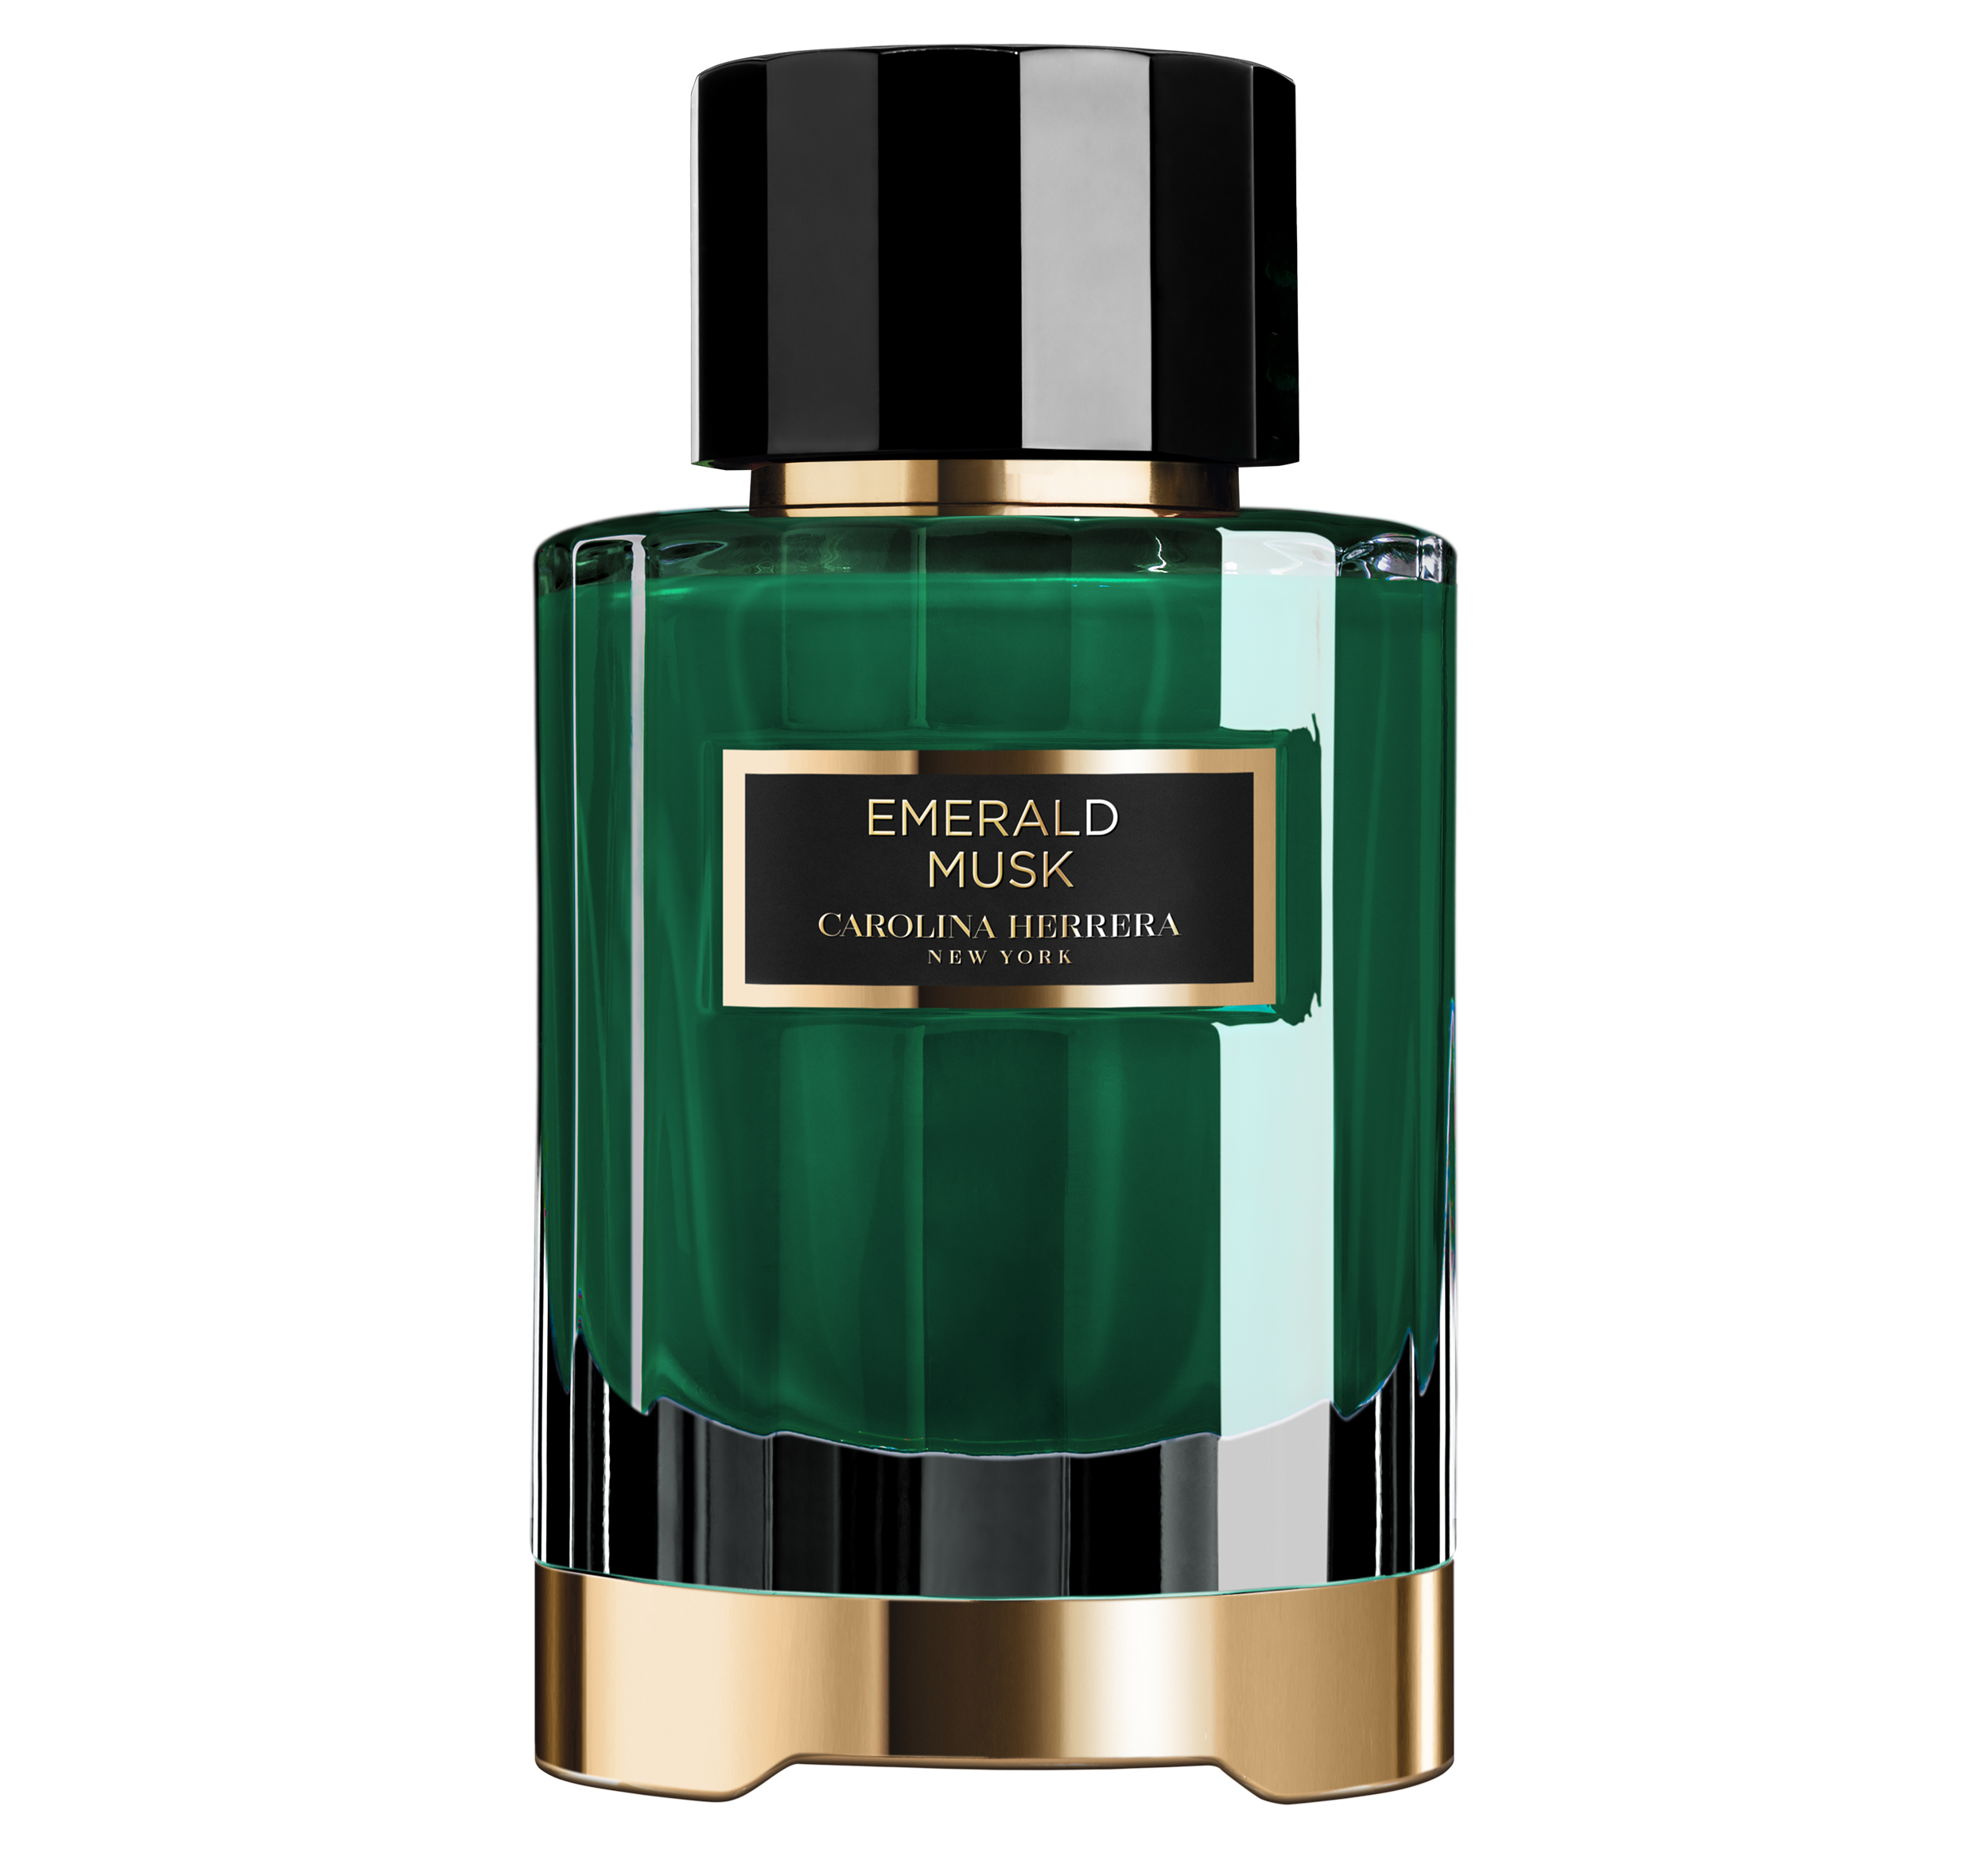 Carolina Herrera Confidential Emerald Musk Eau de Parfum